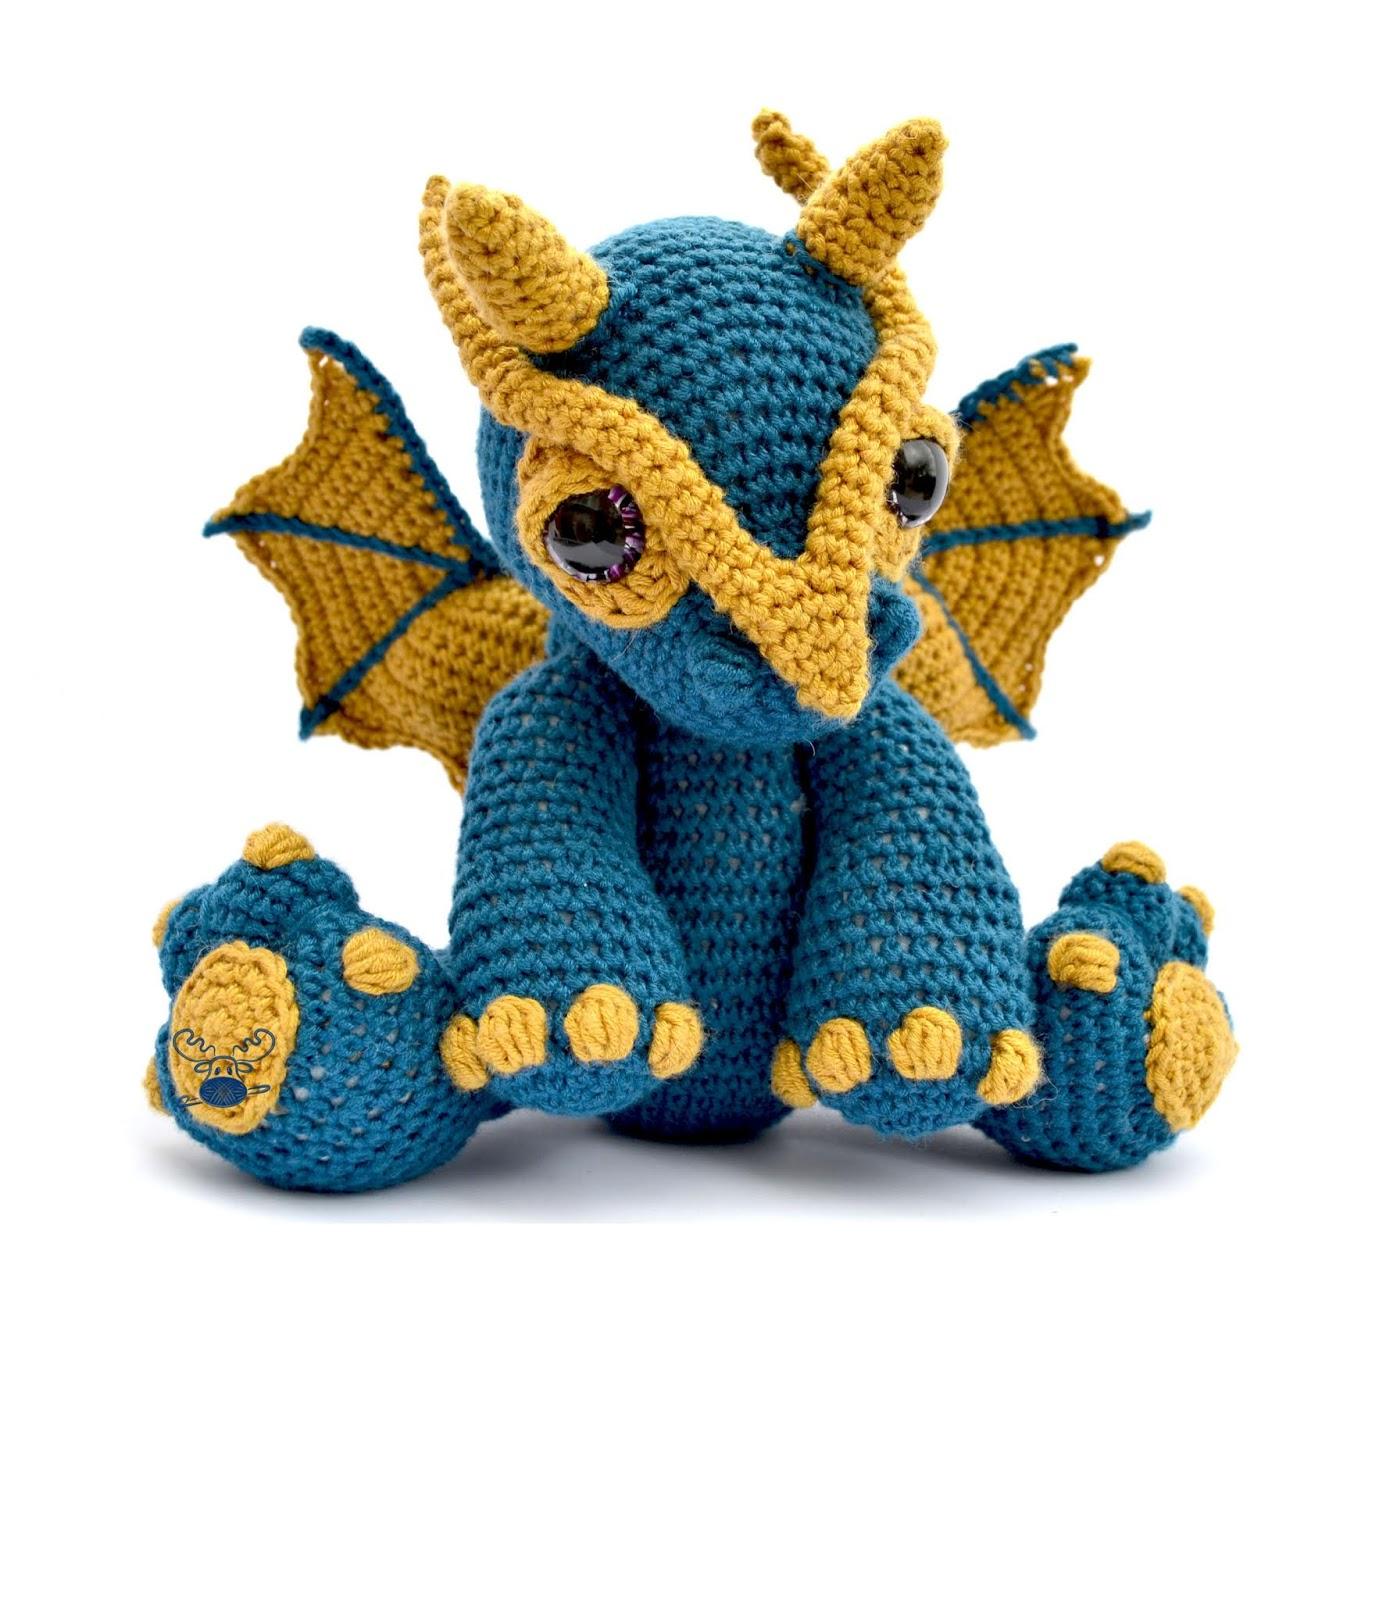 Clancy The Dragon Crochet Pattern Pdf Patchwork Moose